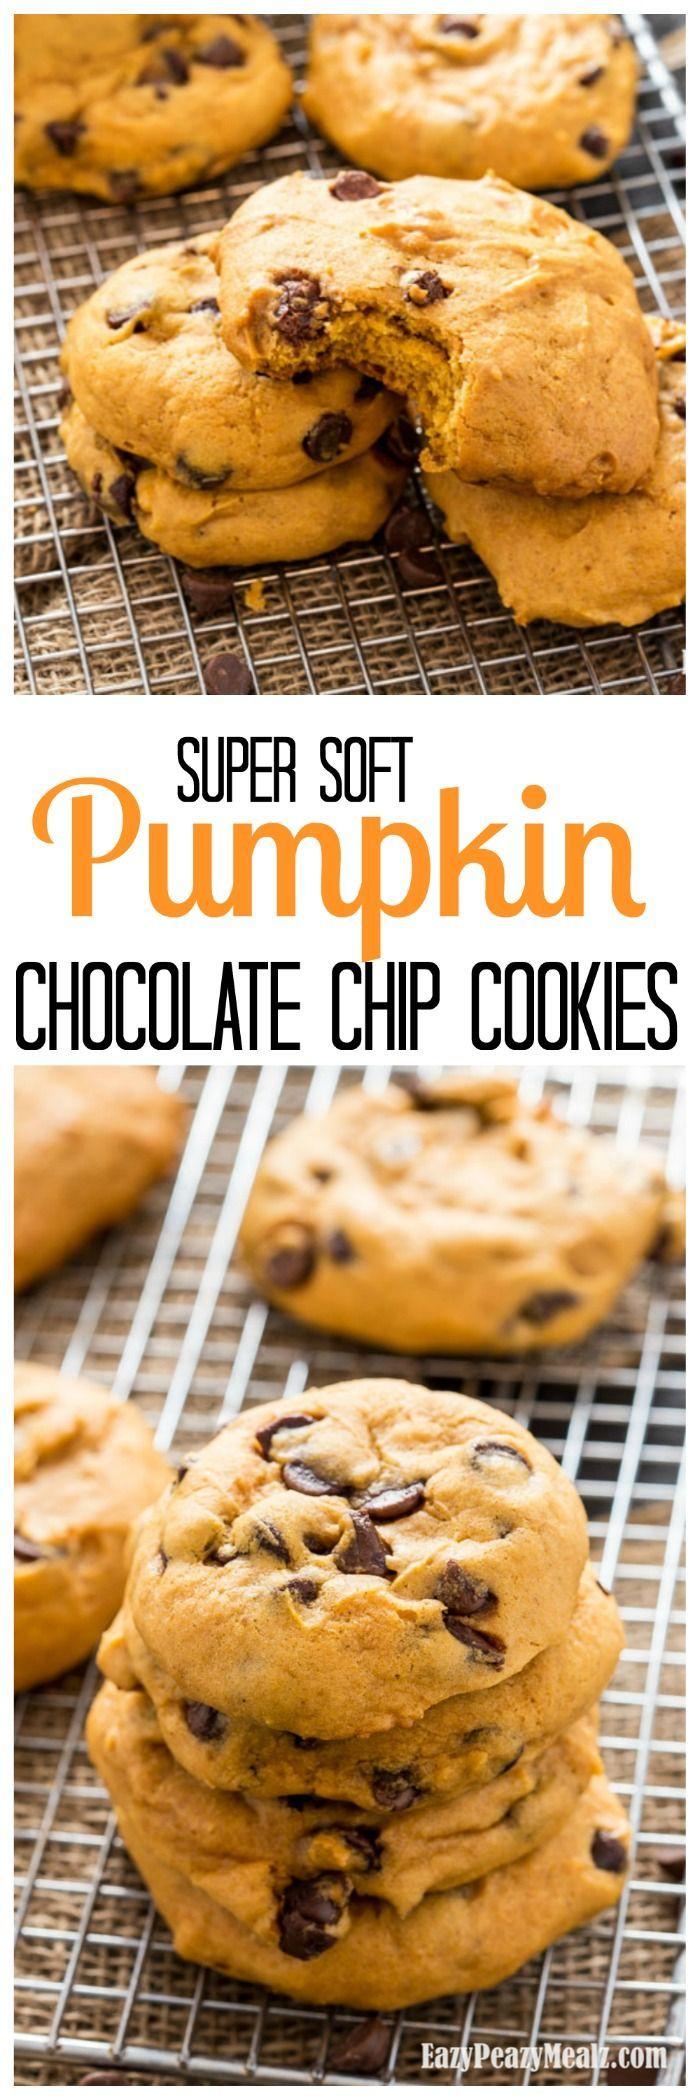 Super Soft Pumpkin Chocolate Chip Cookies: Super soft, and oh so pumpkin-y, this big batch recipe makes delicious pumpkin chocolate chip cookies! - Eazy Peazy Mealz